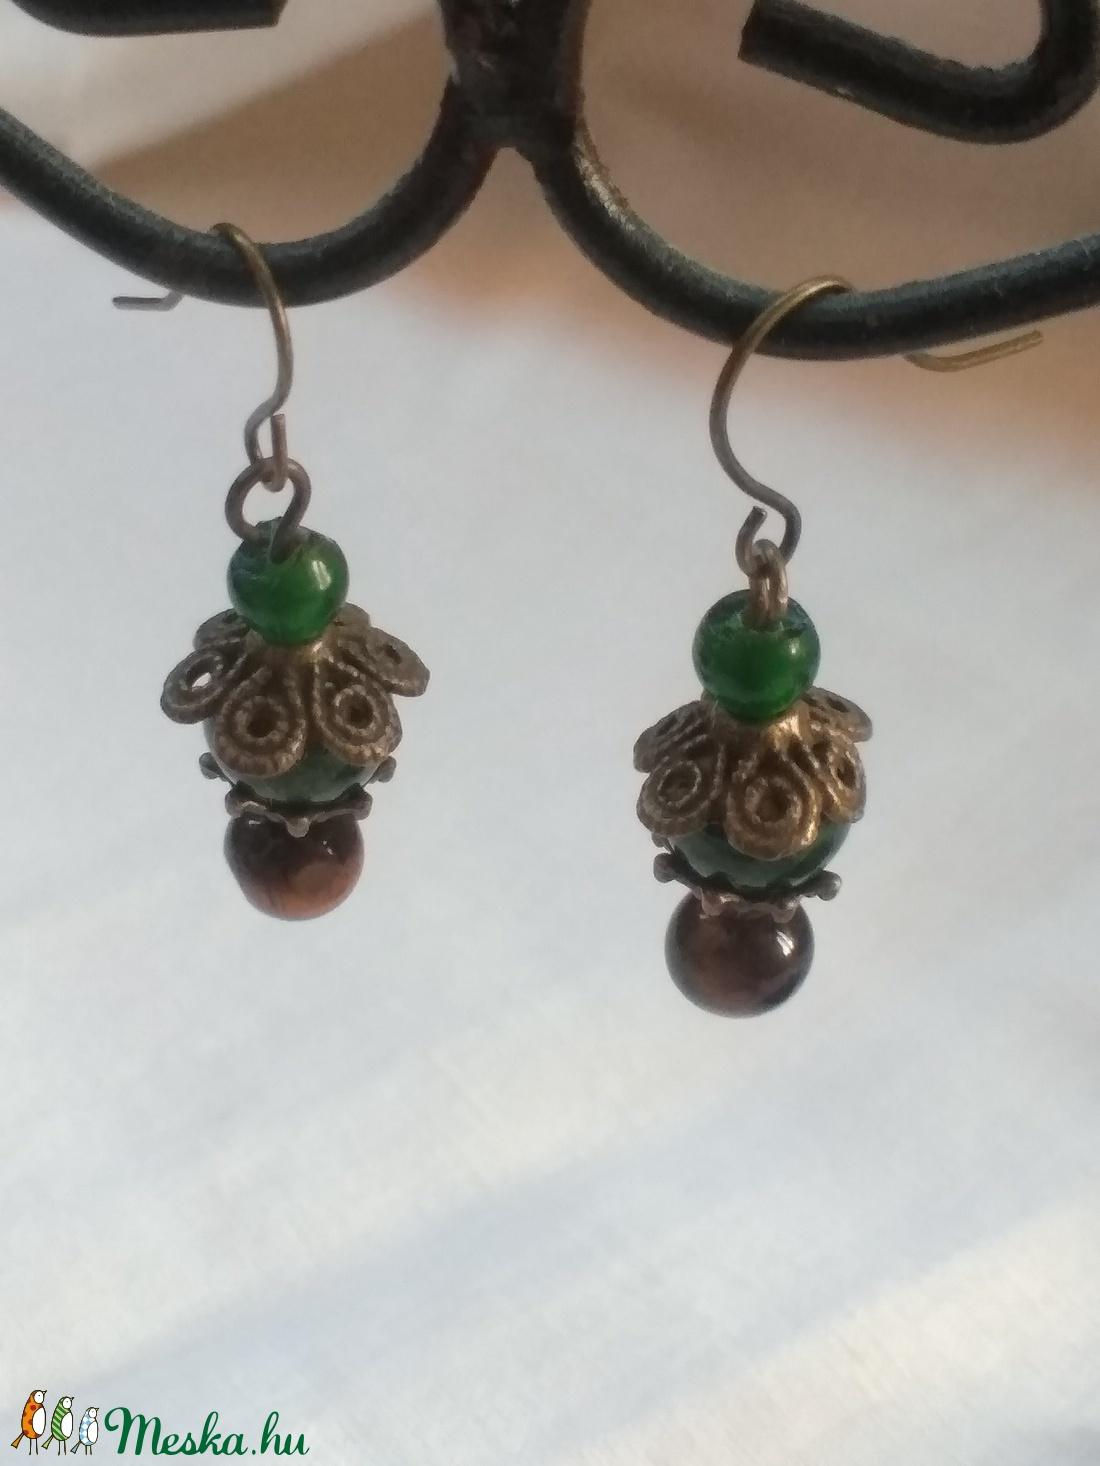 Bogár virág - zöld fülbevaló  réz gyöngyökkel - ékszer - fülbevaló - lógó fülbevaló - Meska.hu